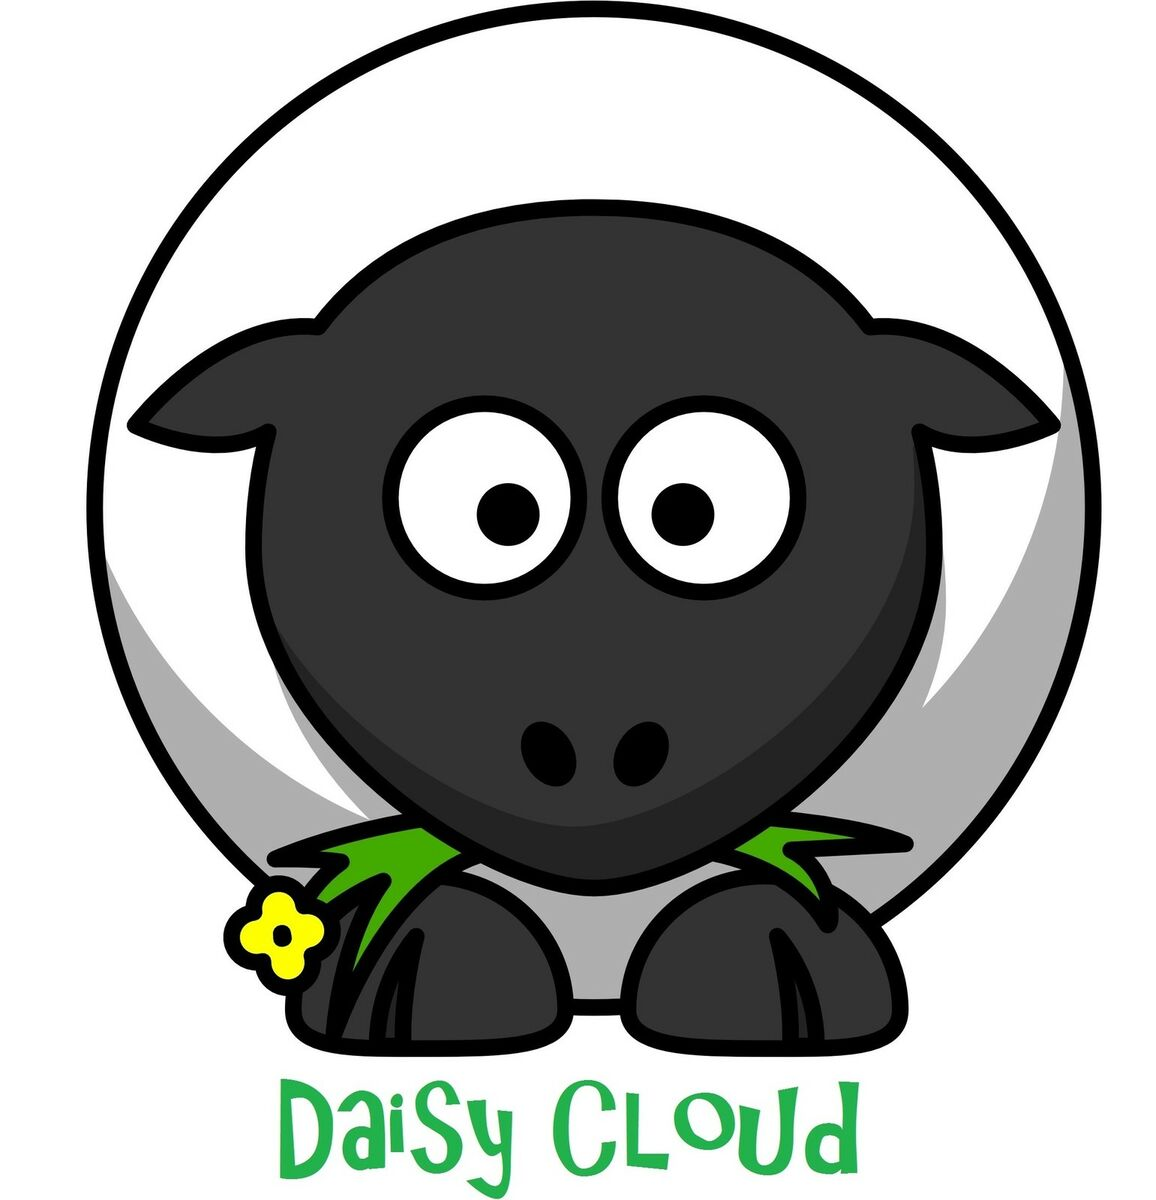 Daisy Cloud Emporium